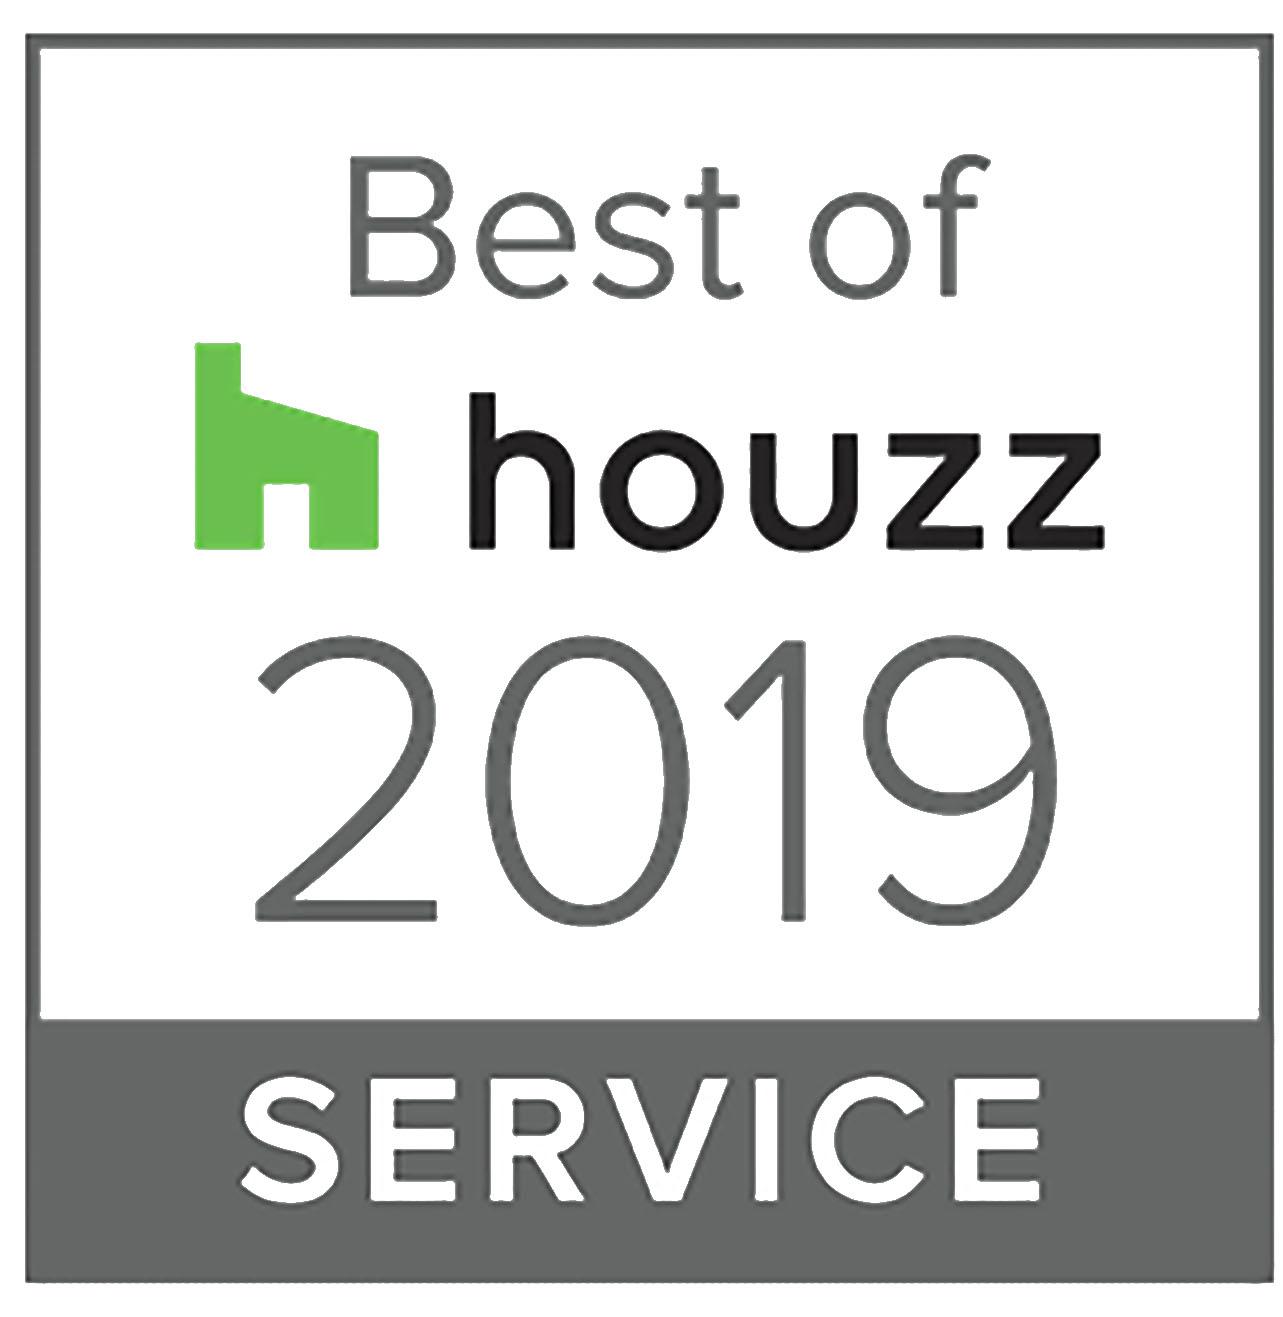 2019-best-of-houzz-service-badge-big.jpg